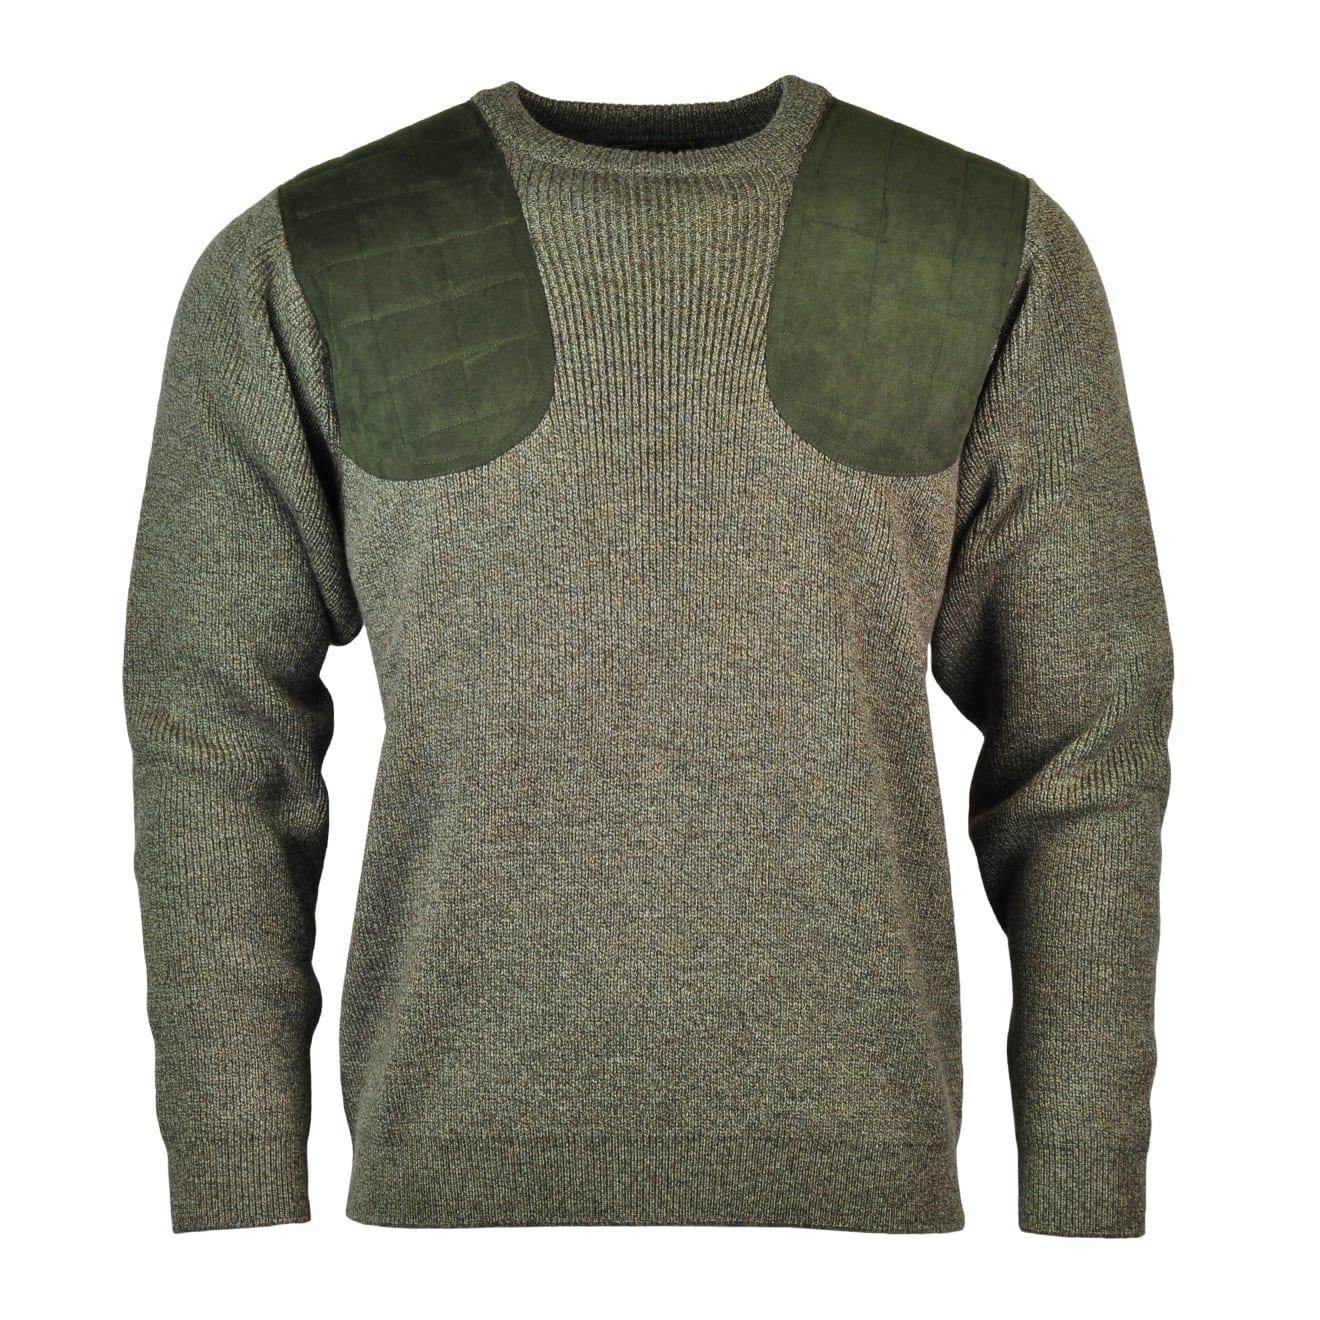 James Purdey Crew Neck Marl Shooting Sweater Khaki Green